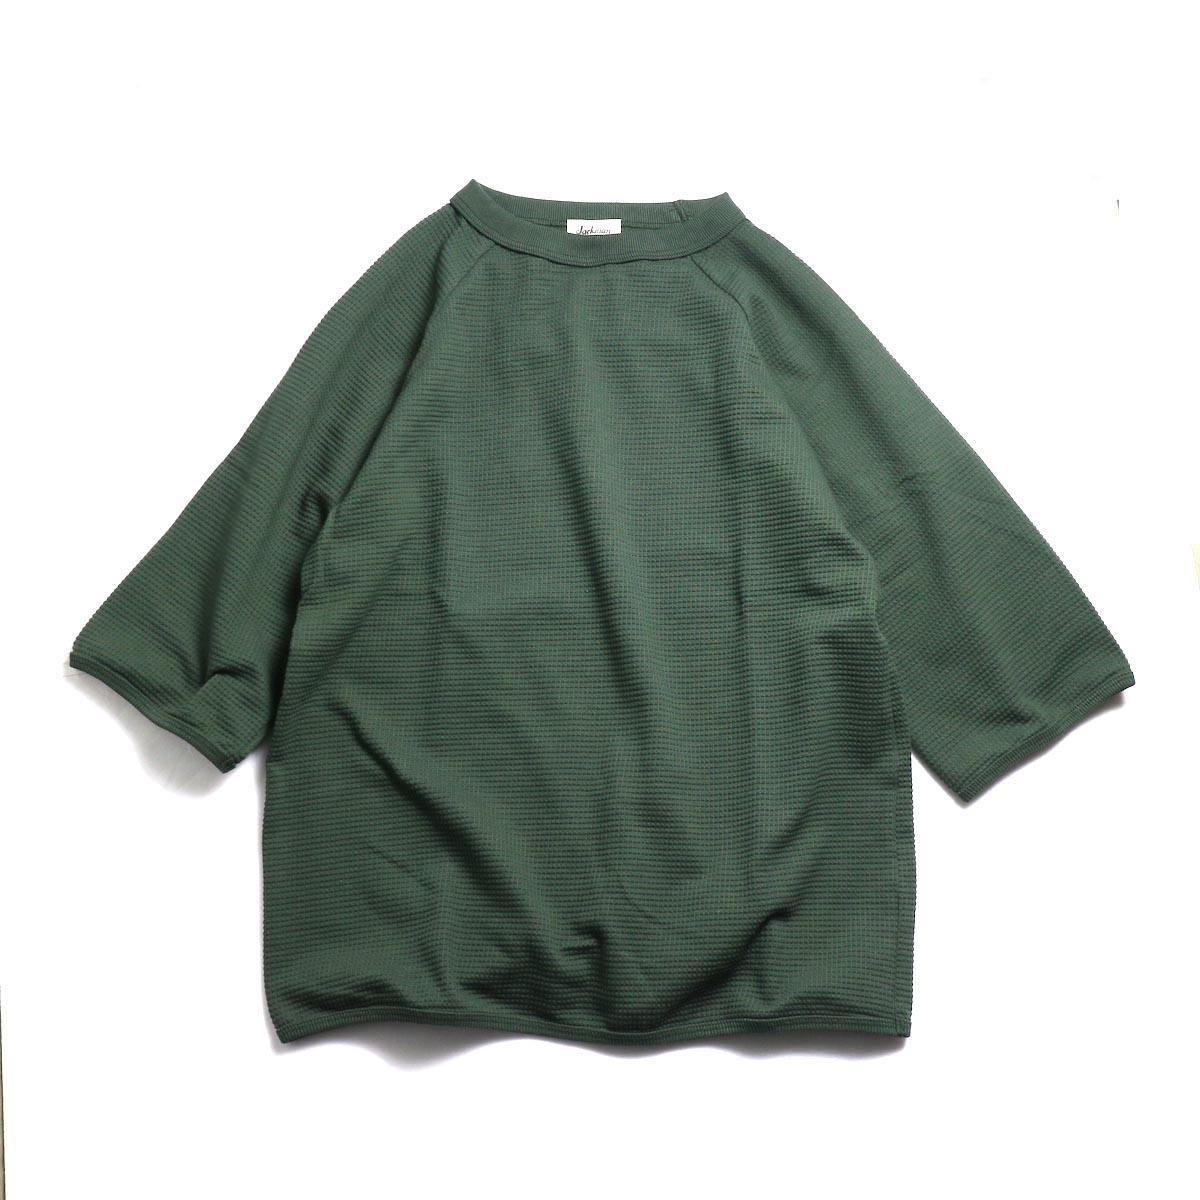 Jackman / 1/2 Sleeved T-Shirt -Ivy